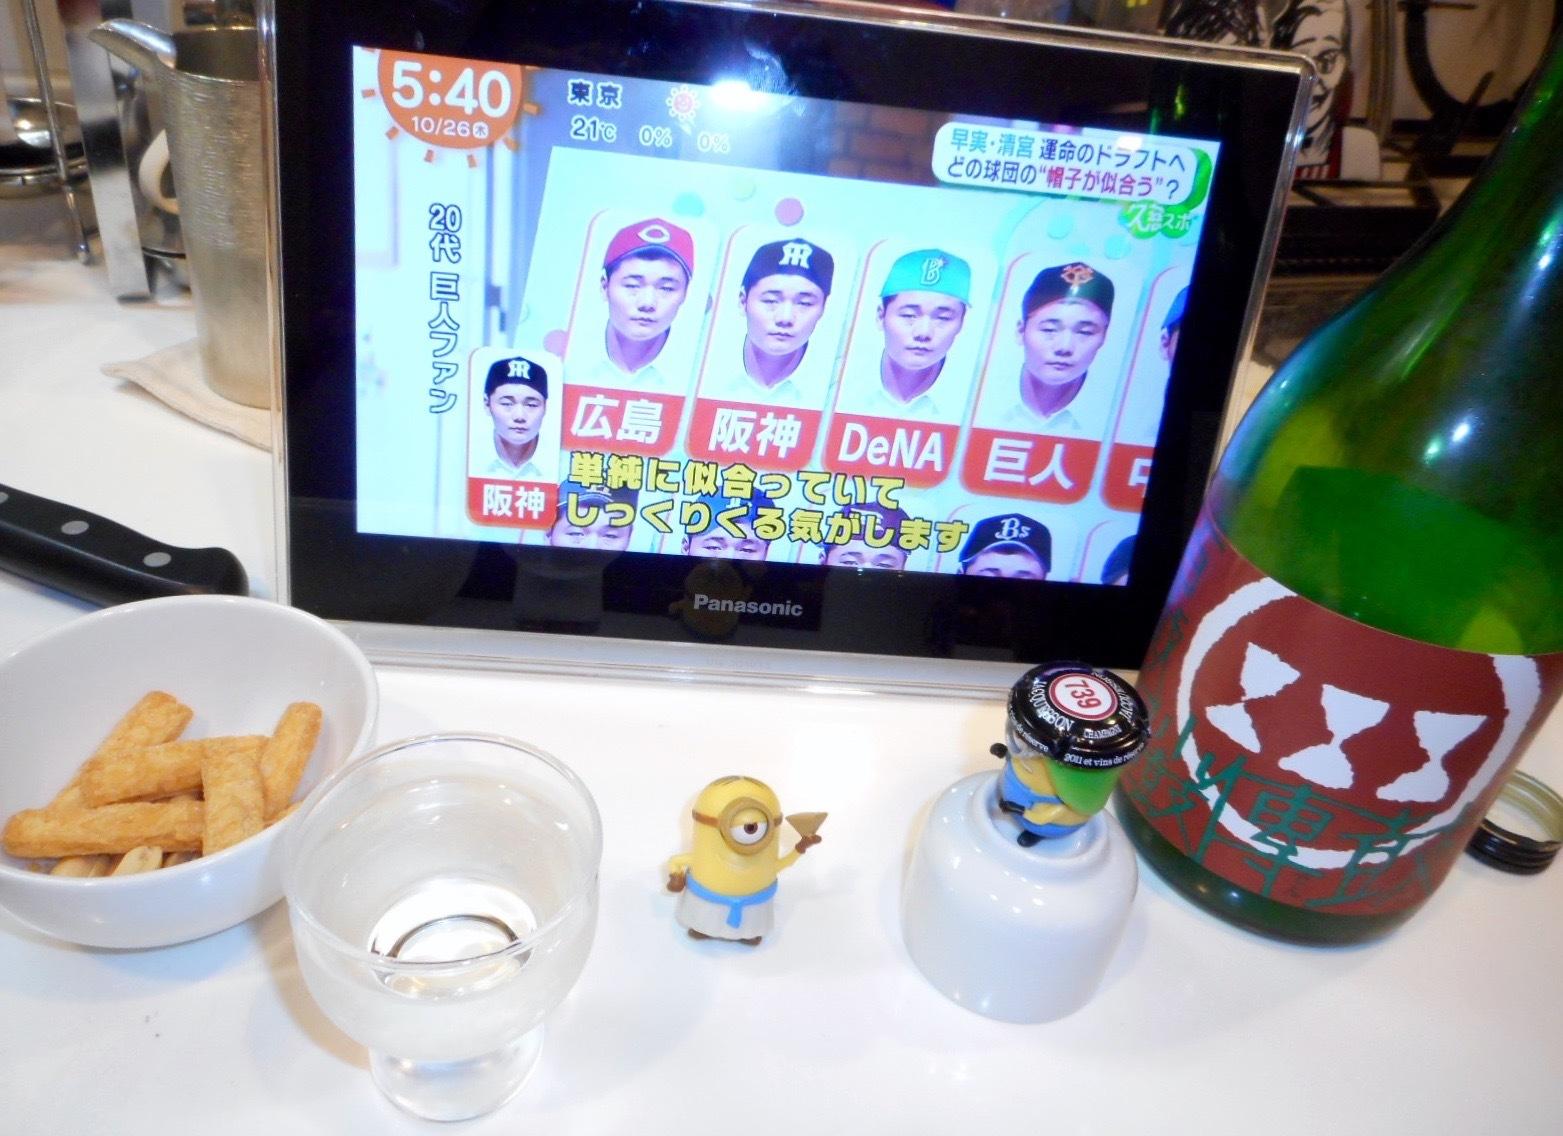 kozutsumi_koden28by11.jpg